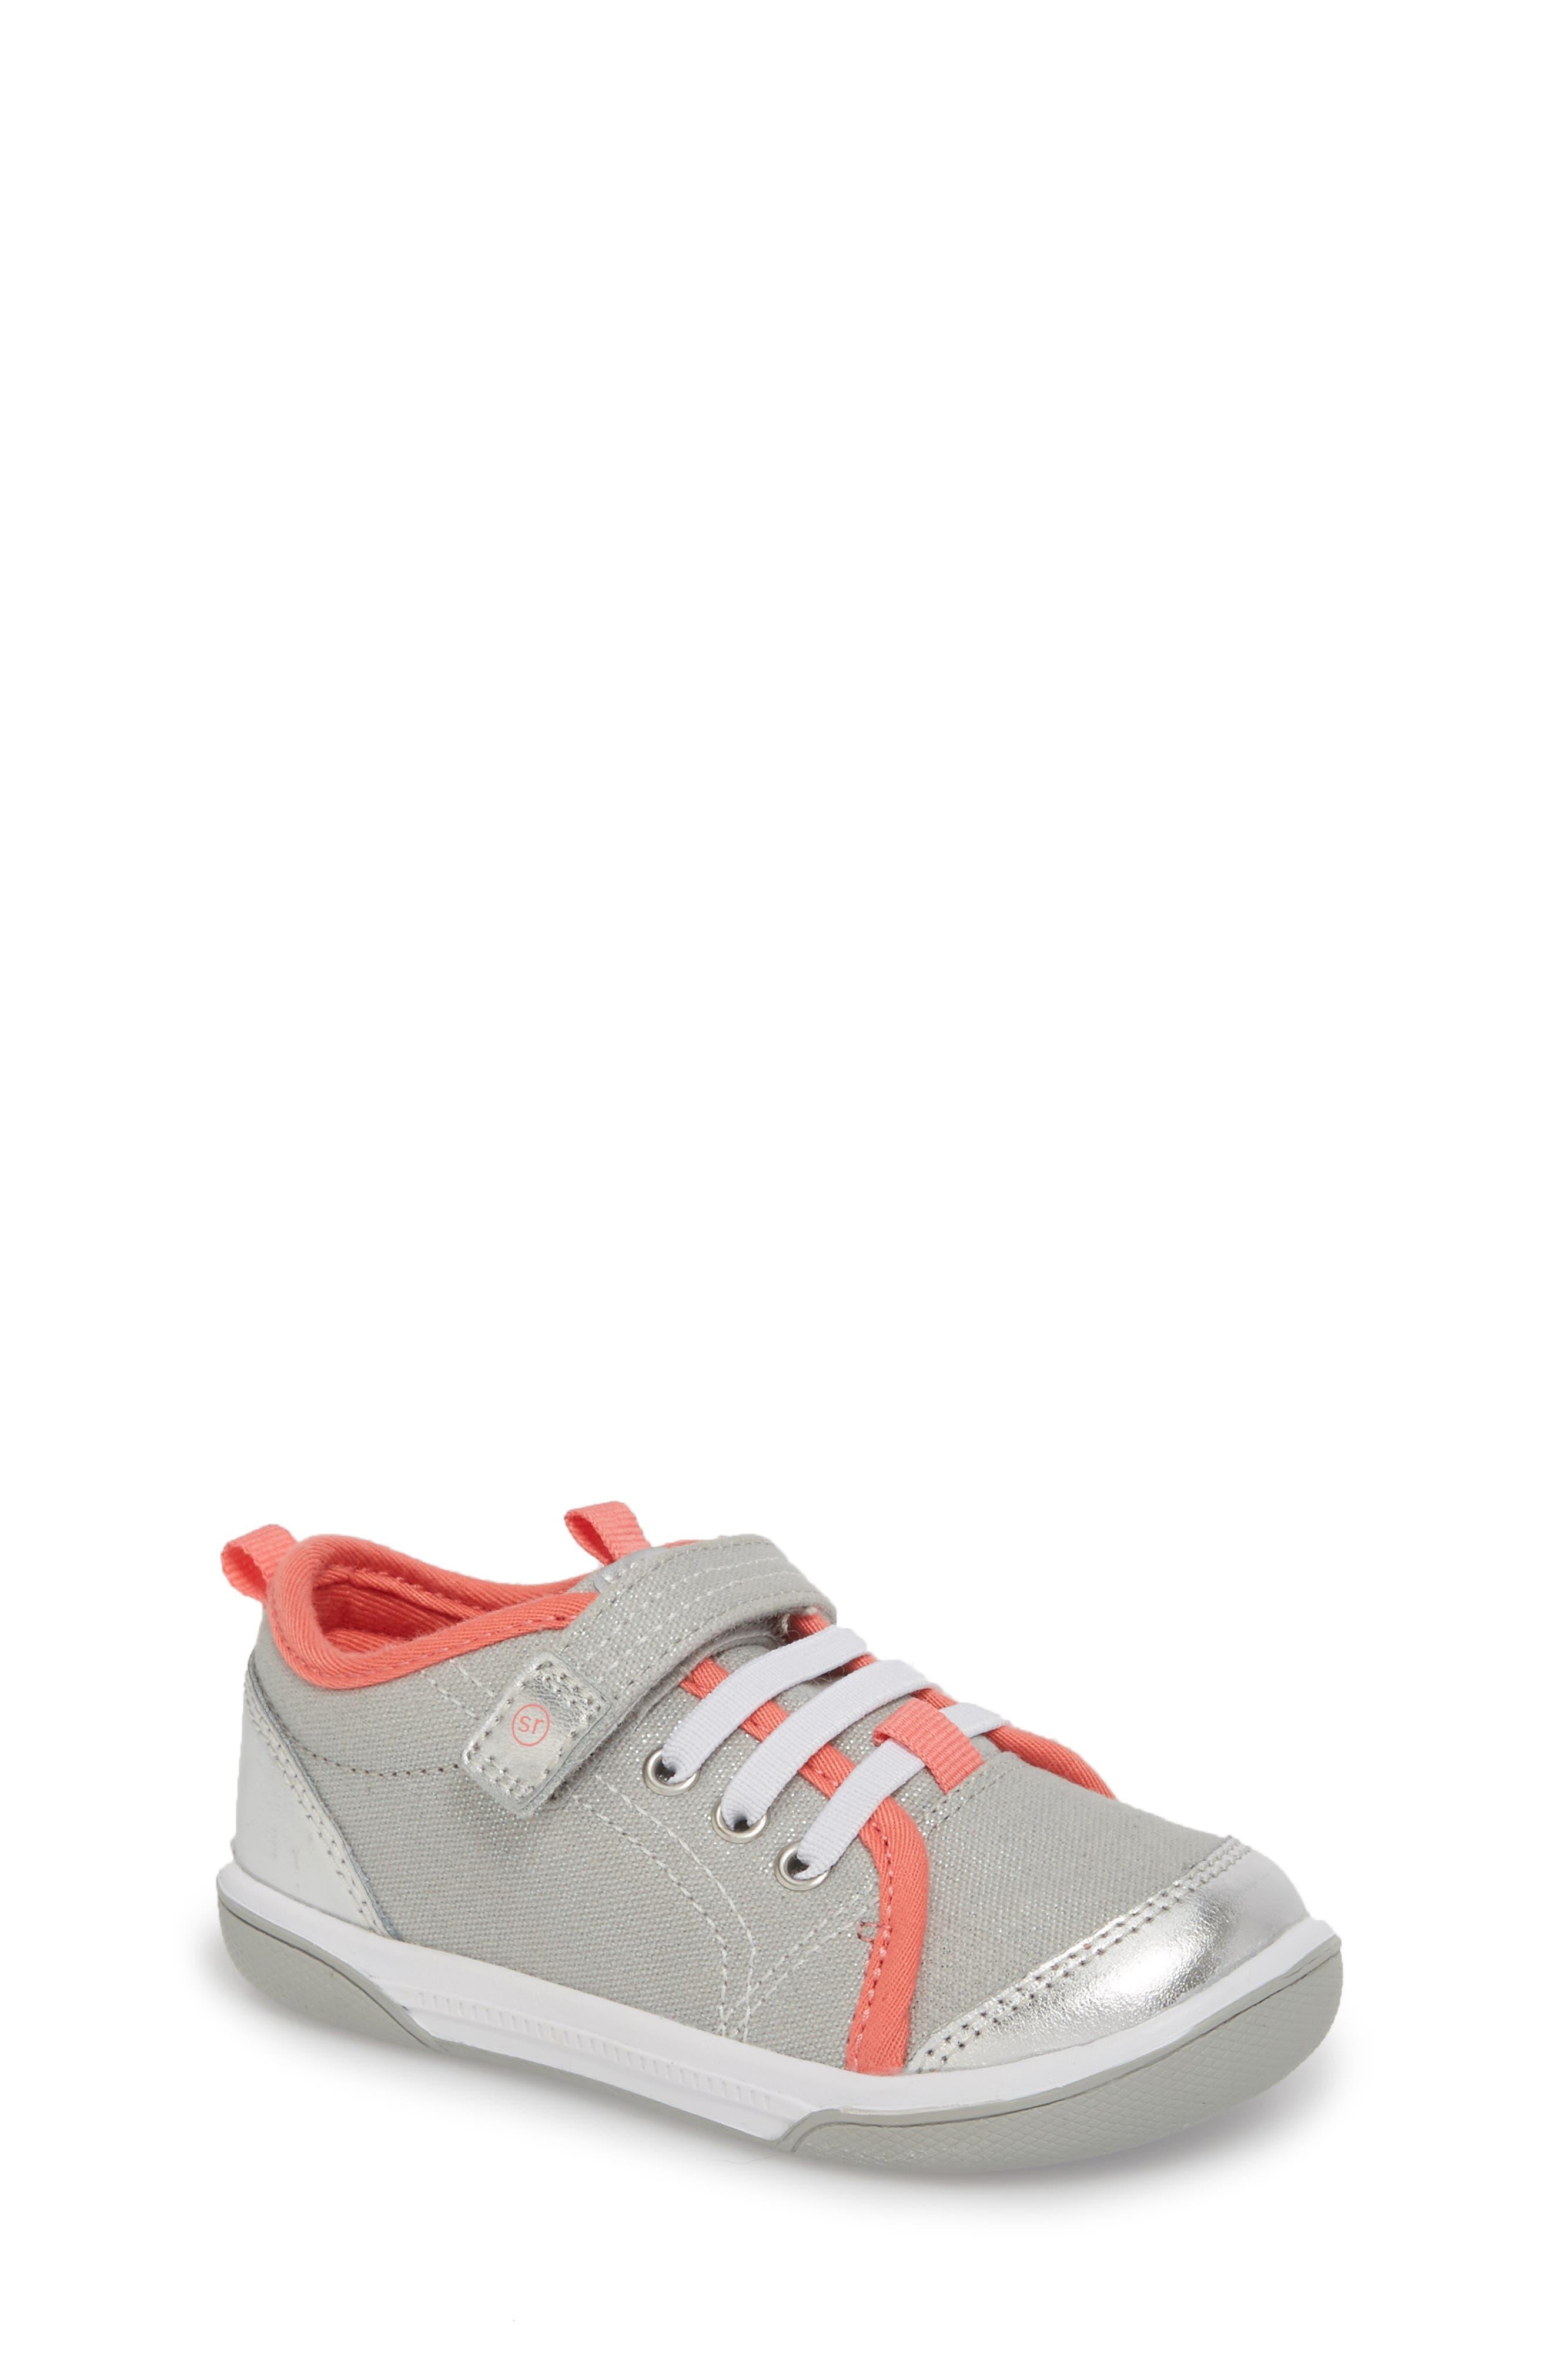 Dakota Sneaker,                         Main,                         color, LIGHT GREY CANVAS